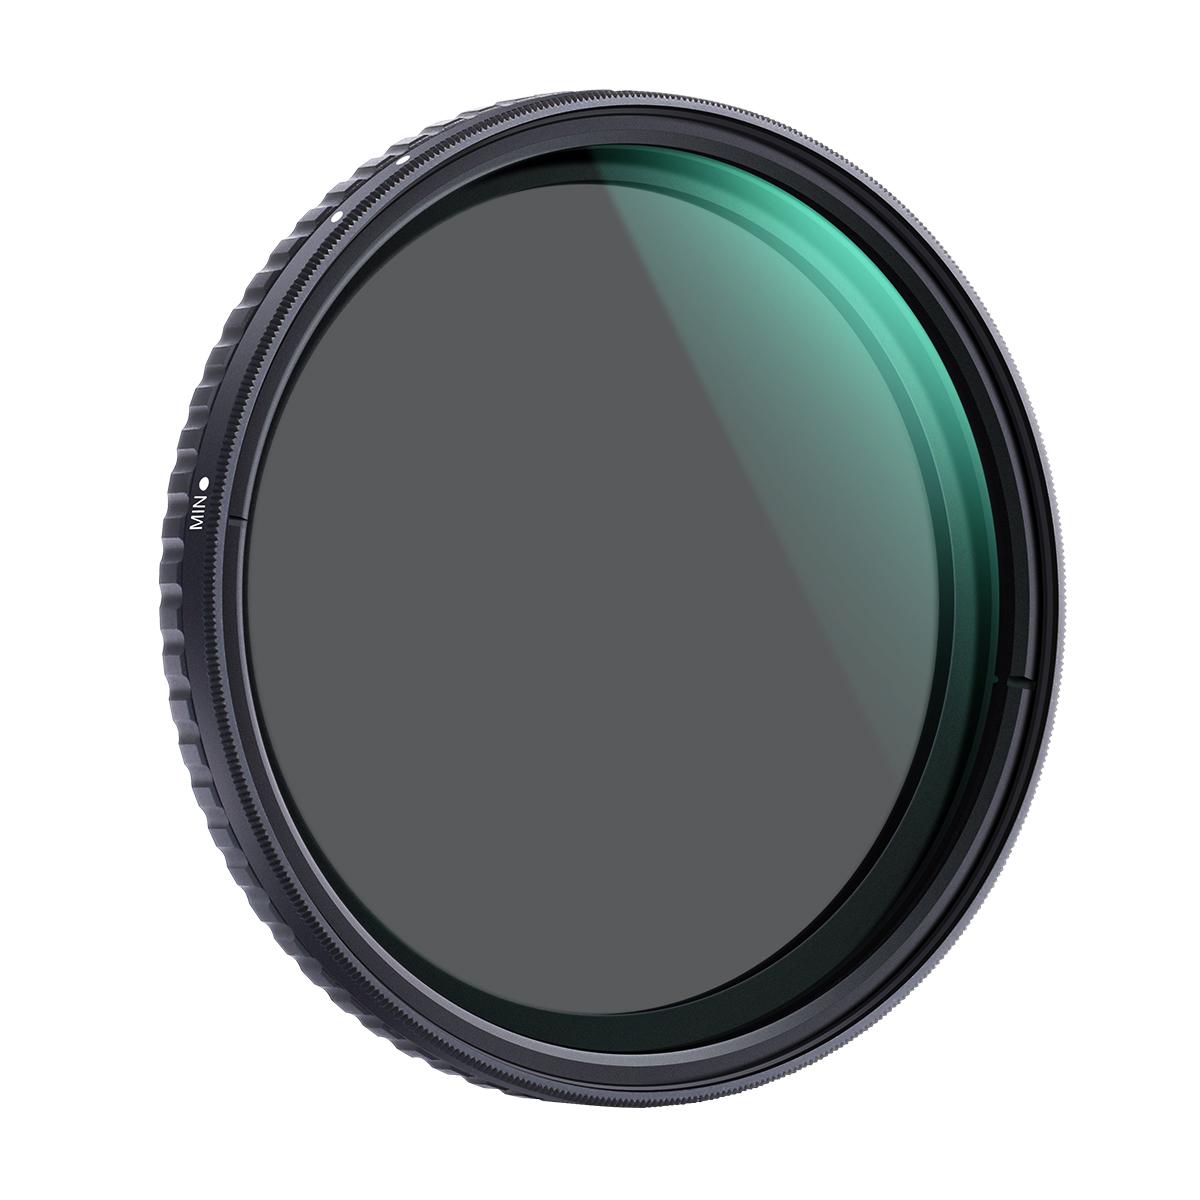 K&F Concept NANO-X バリアブル(可変式)NDフィルター Xムラ制御タイプ 減光範囲 ND2 - ND32|KF-NDX2-32